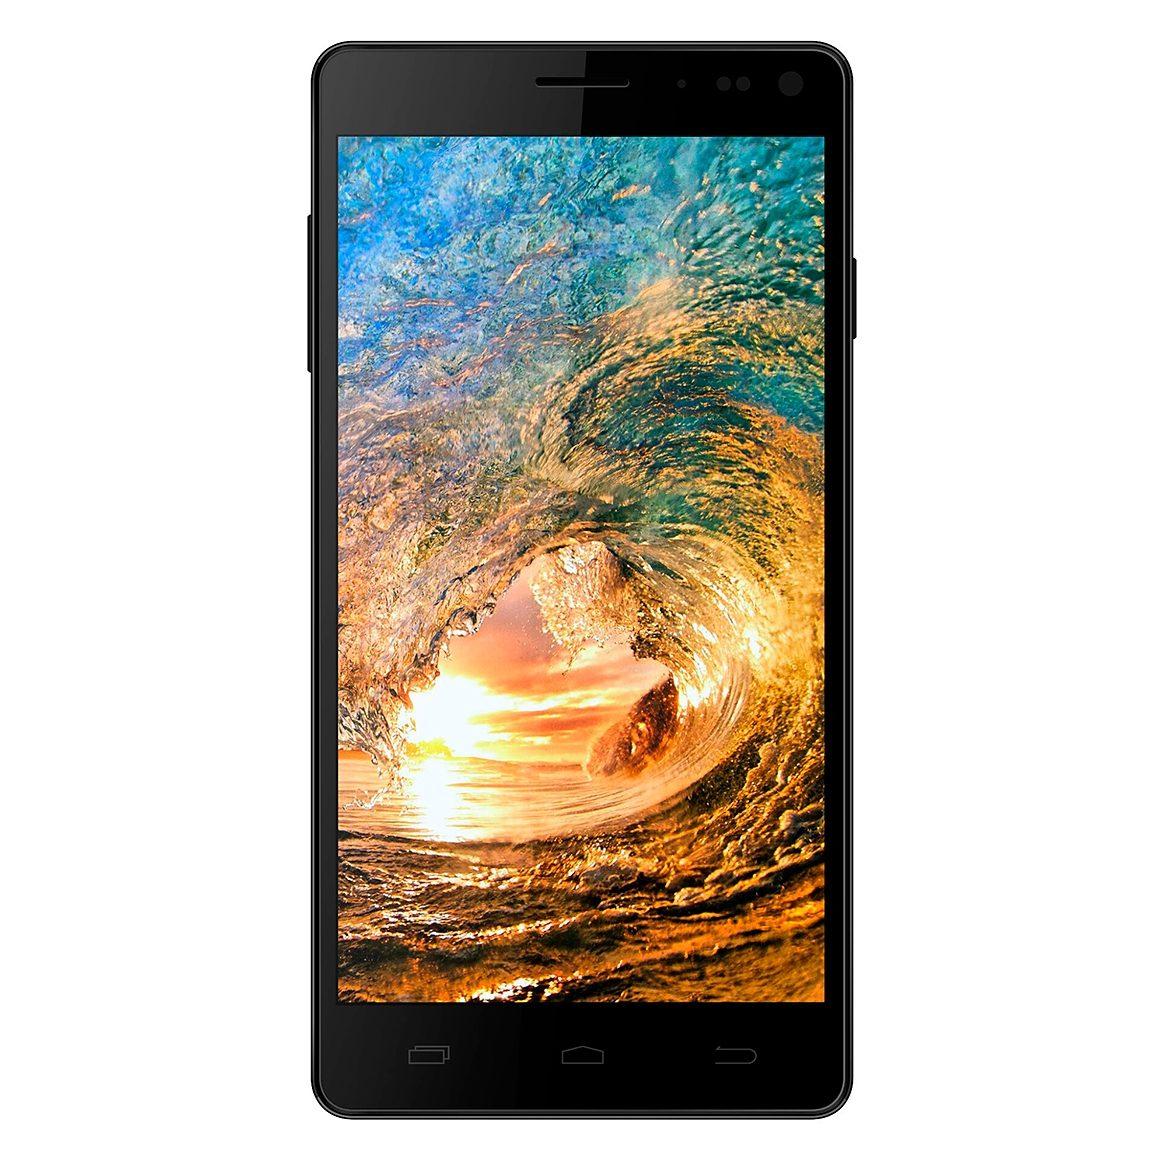 Siswoo Smartphone »R8 Monster«